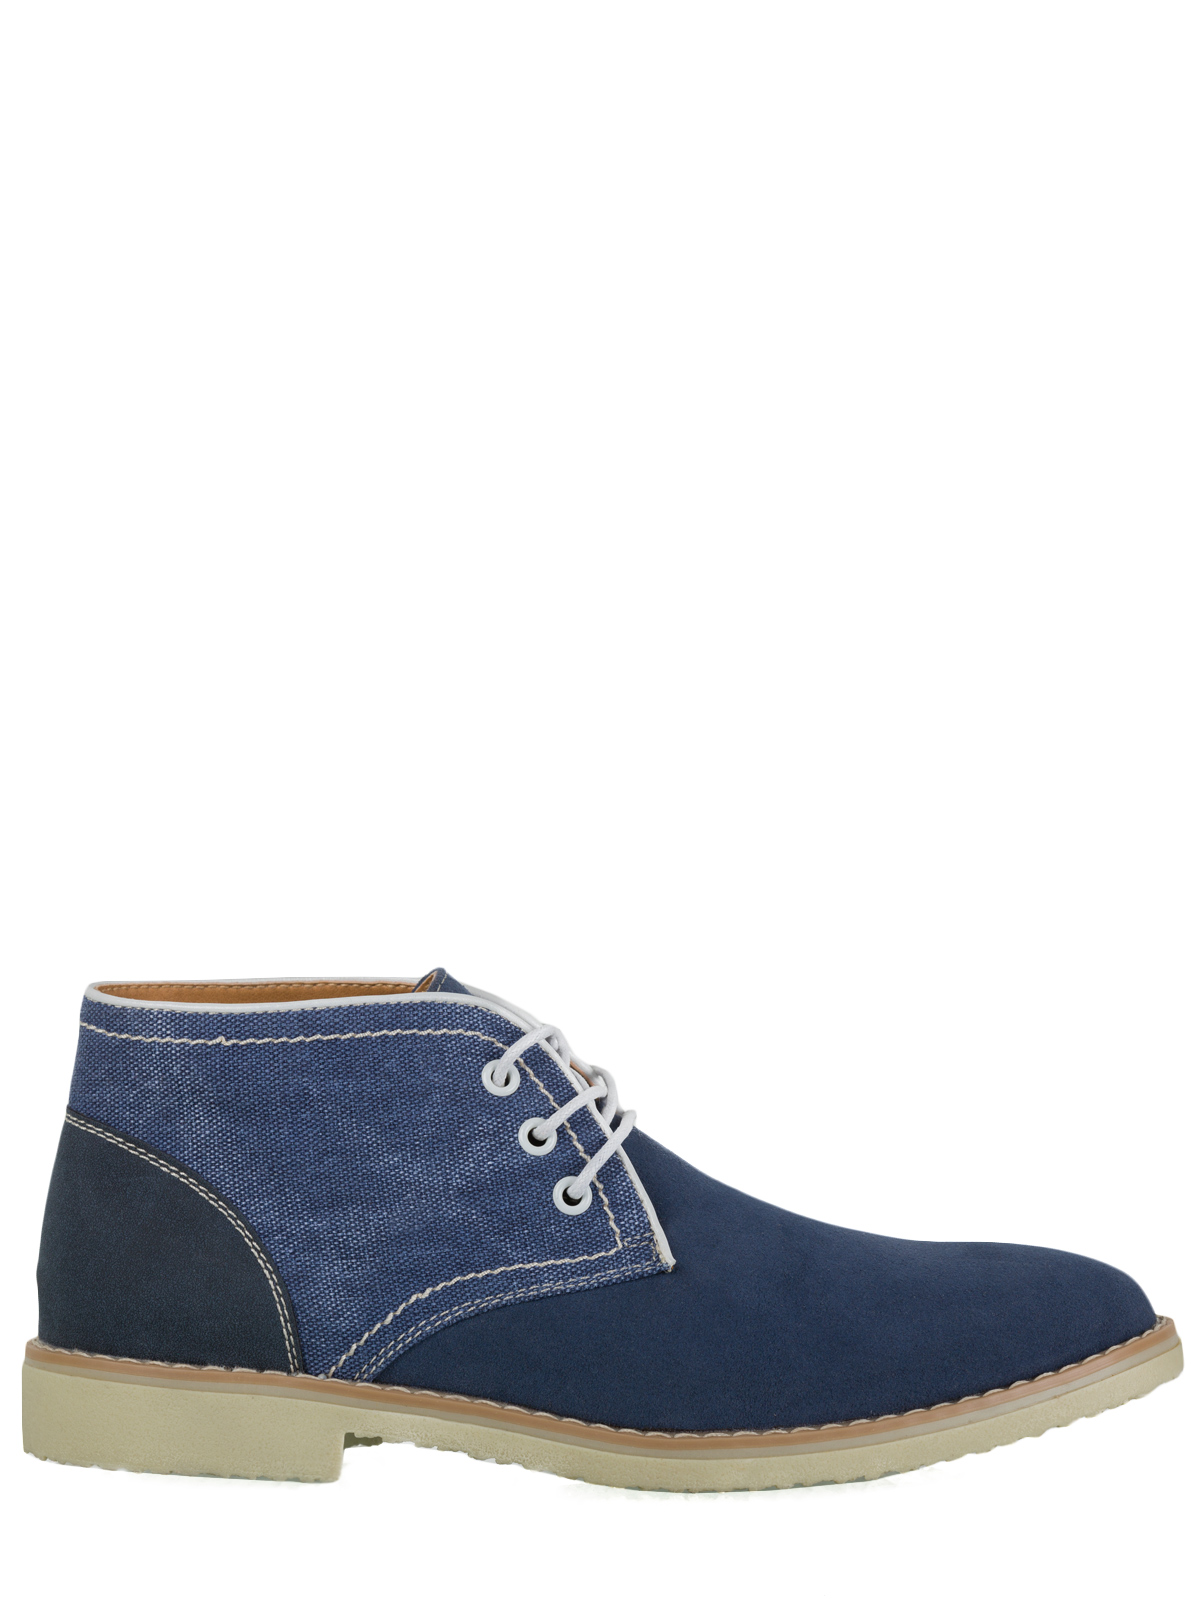 825646ea7f2 Ανδρικά Παπούτσια | priceAsc - Eye on Fashion